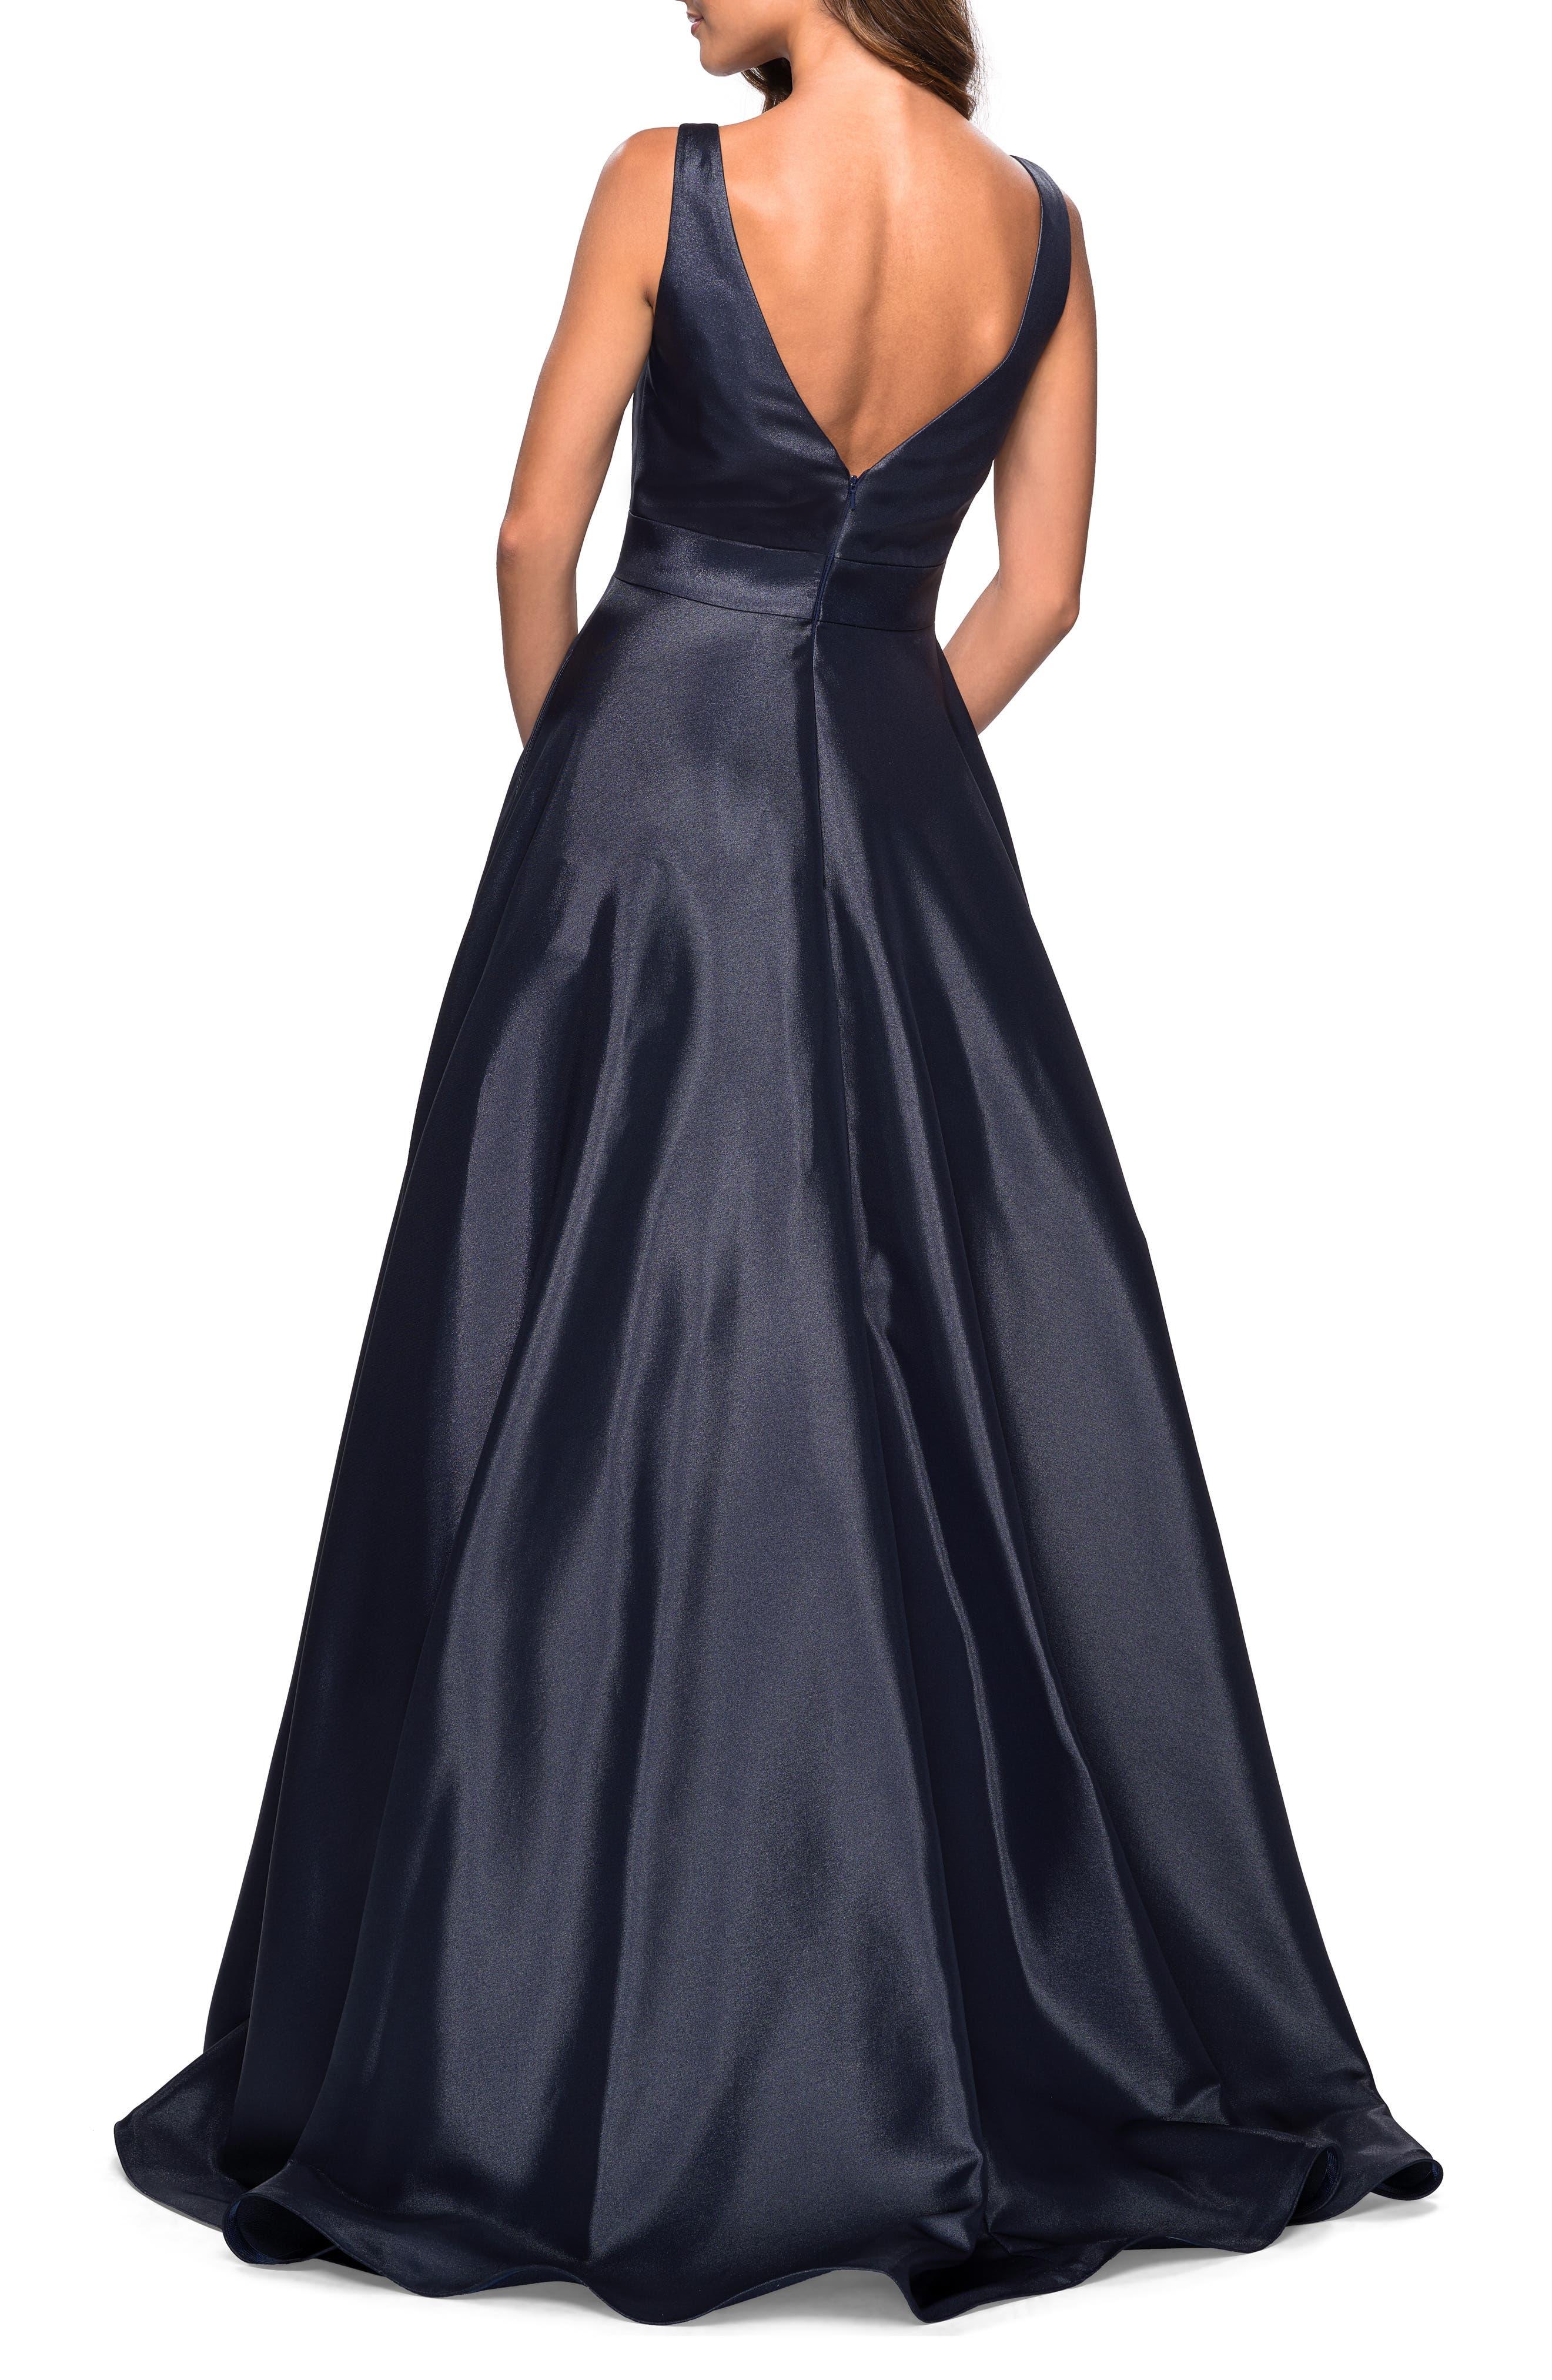 LA FEMME, Mikado Evening Dress, Alternate thumbnail 2, color, NAVY